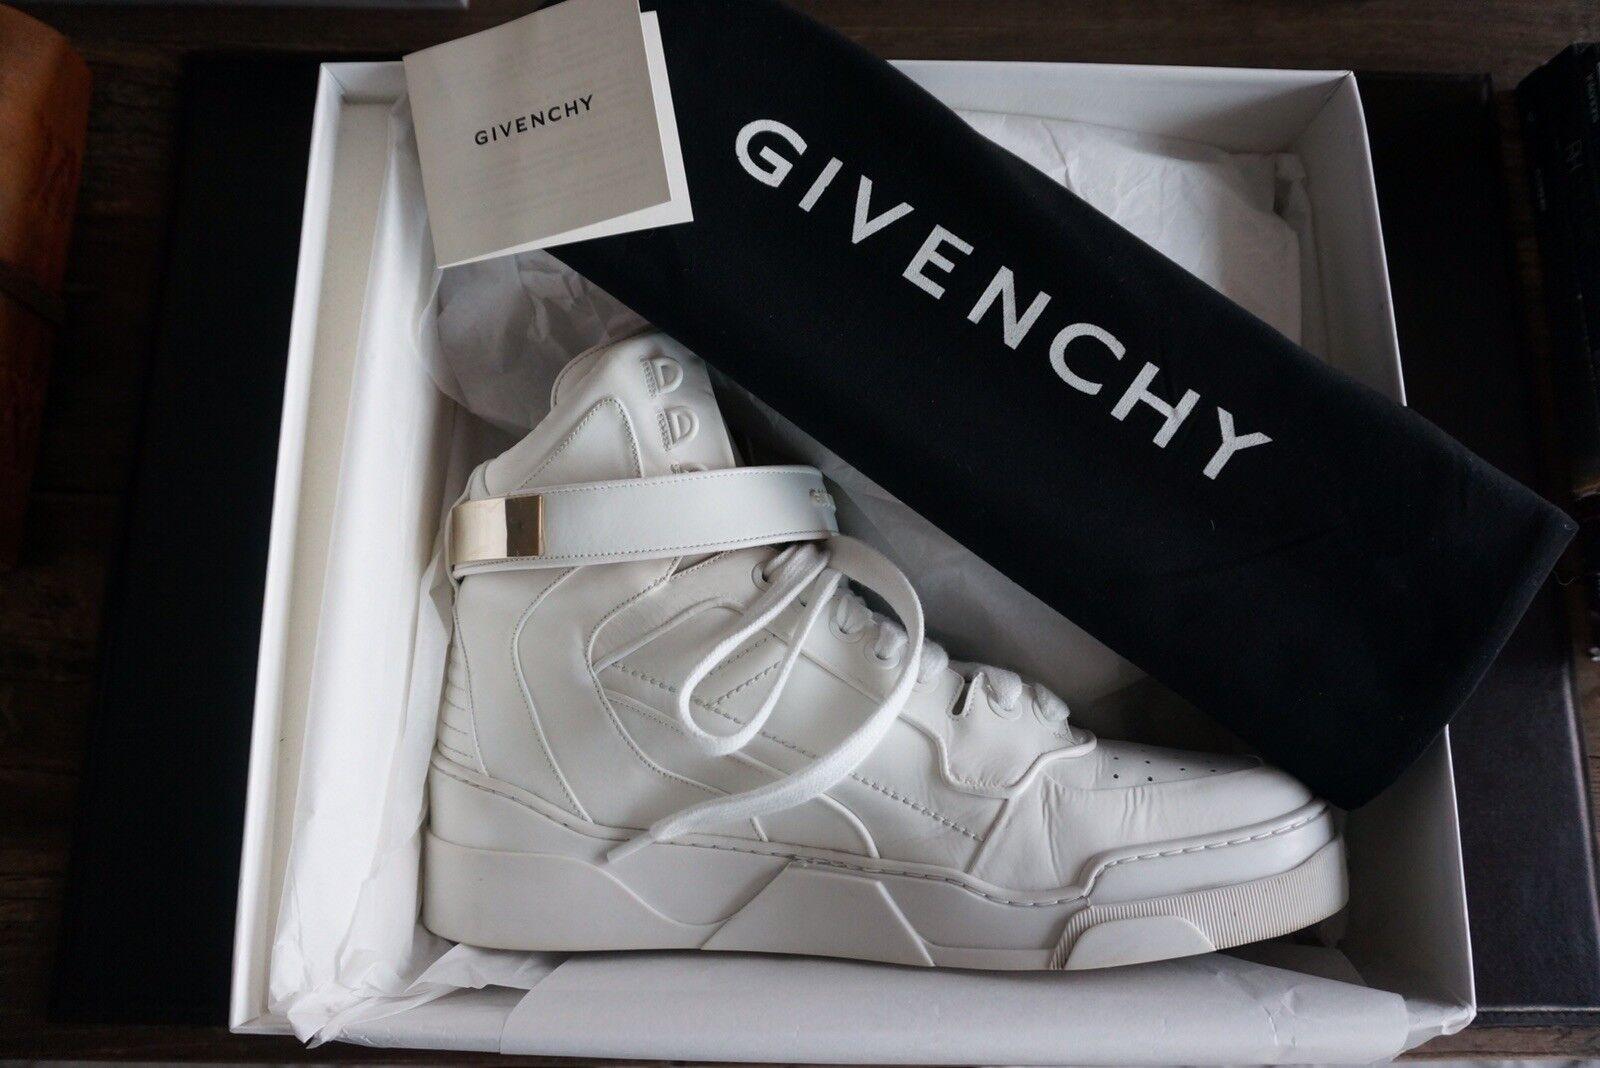 Men's Authentic Givenchy bianca Leather Hightop scarpe da ginnastica - Dimensione 45